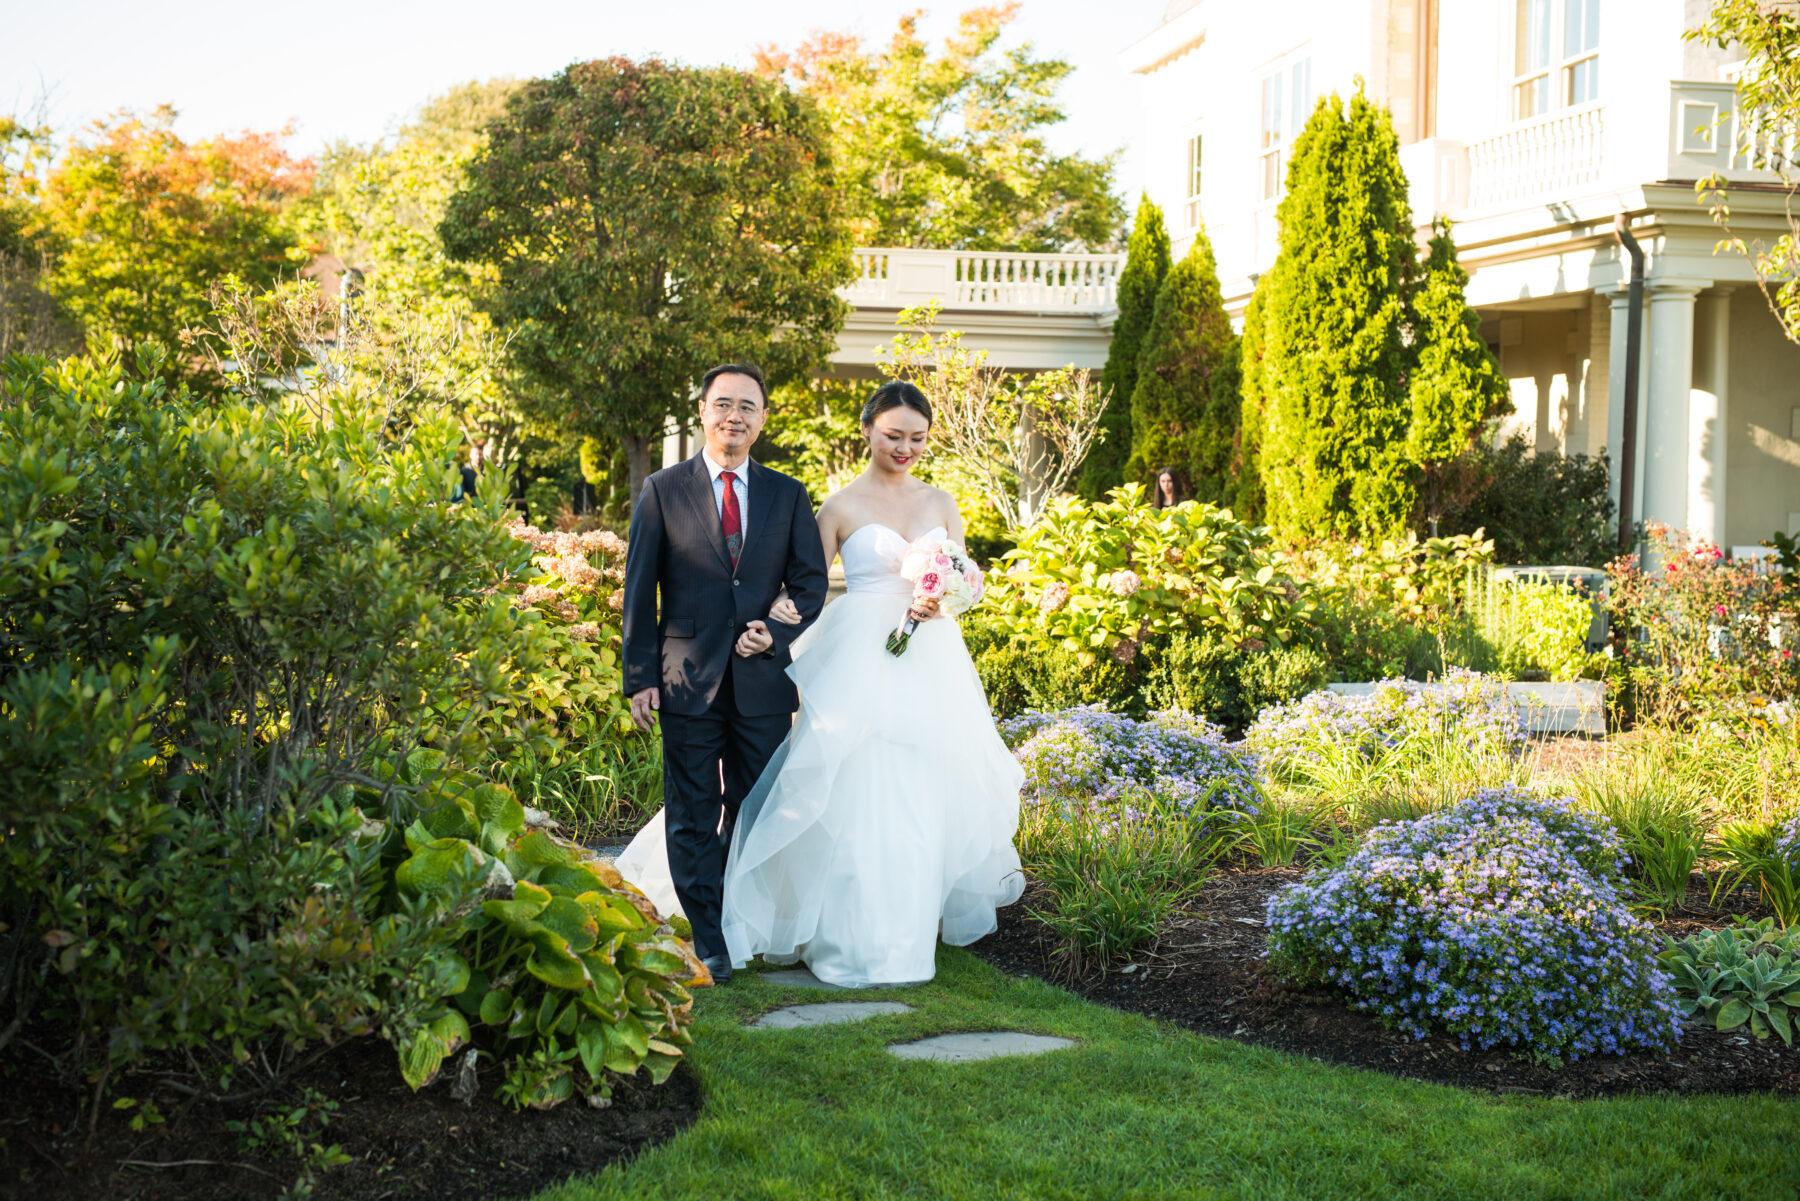 Chanler Newport Wedding Jie and Ahbishek Blueflash Photography 17